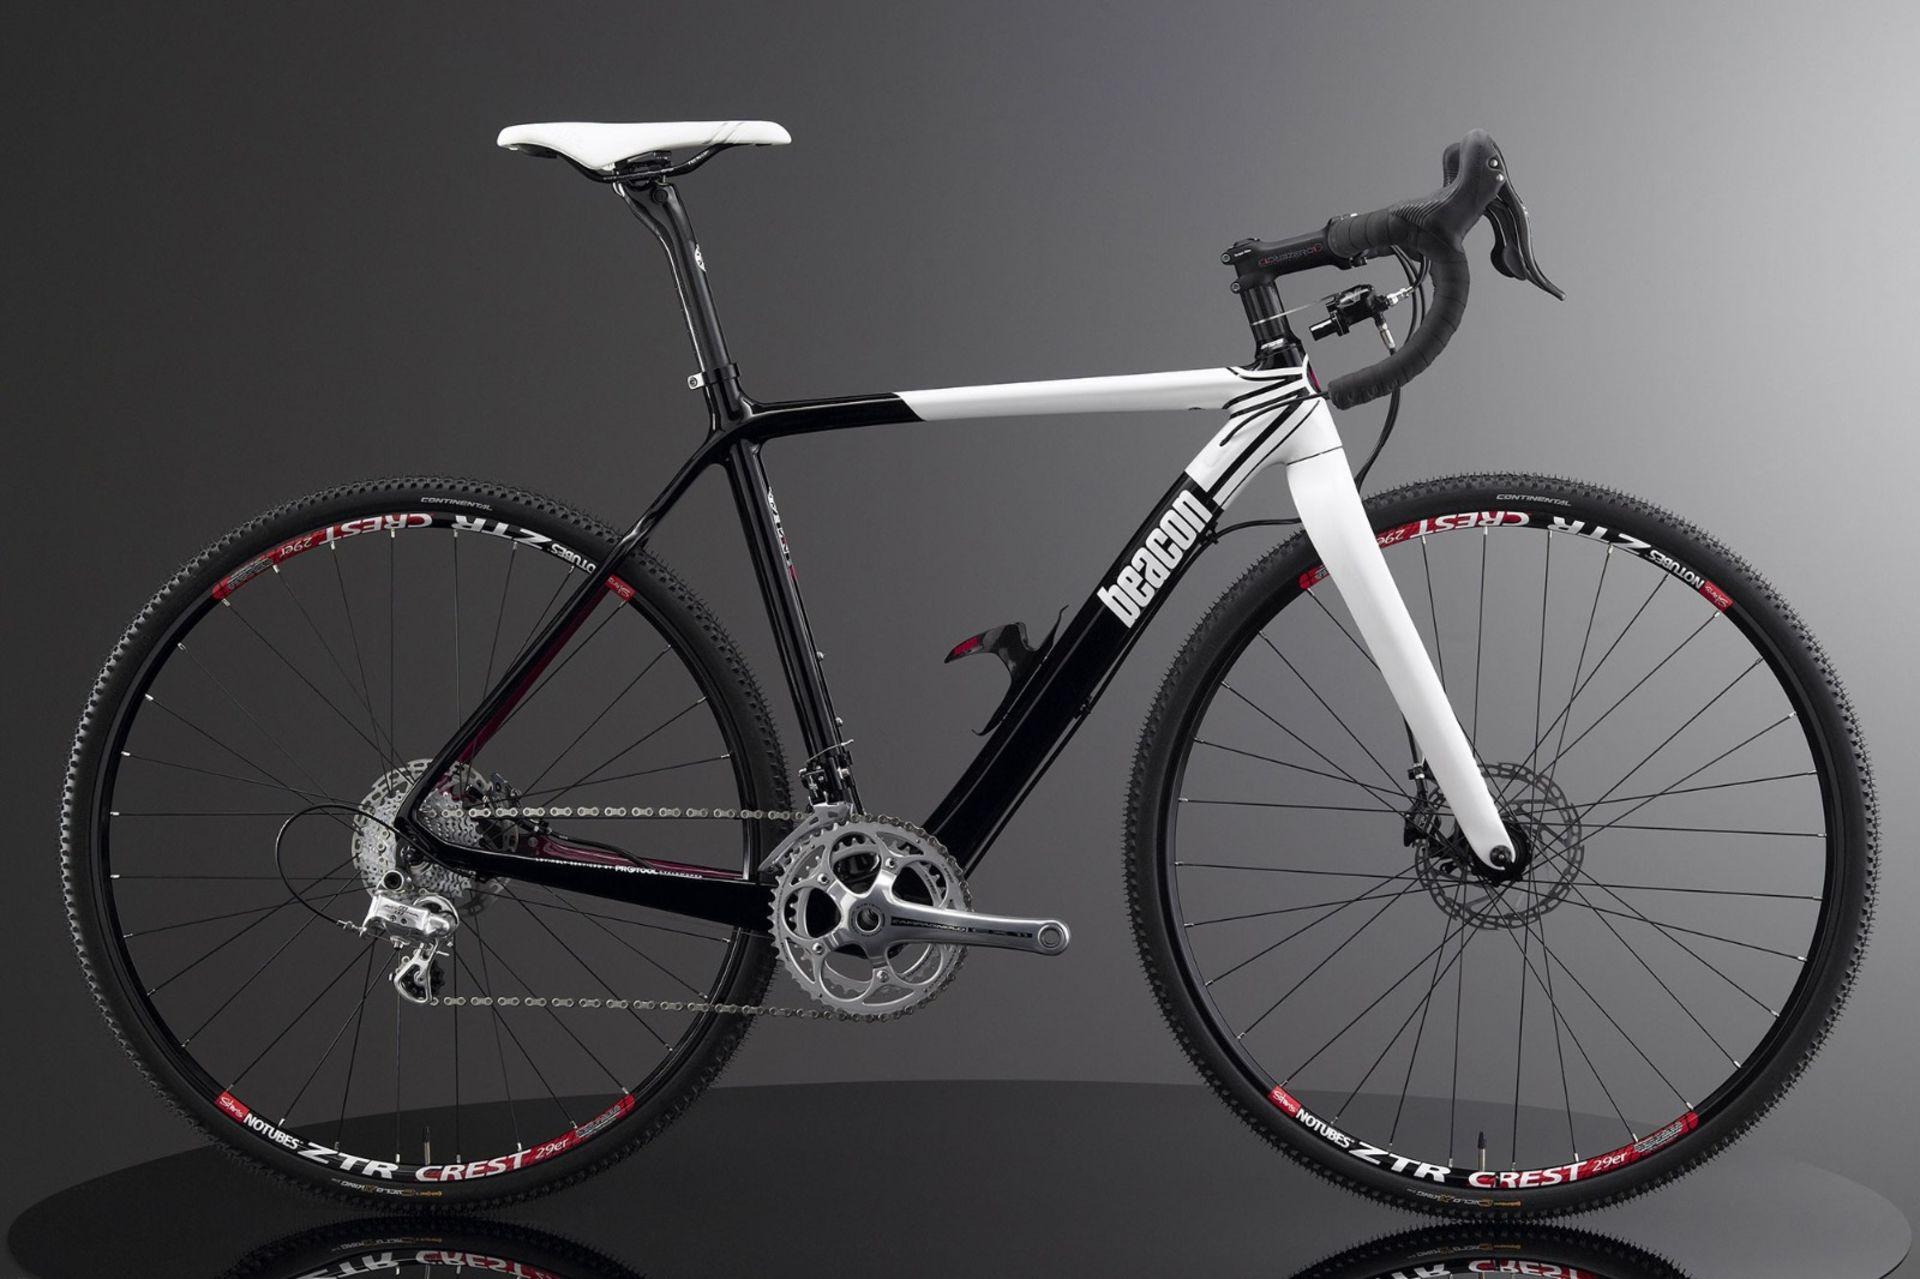 Lot 44 - 1 x Beacon Model BF-45, Size 580, Carbon Fibre Bike Frame in Black & White.